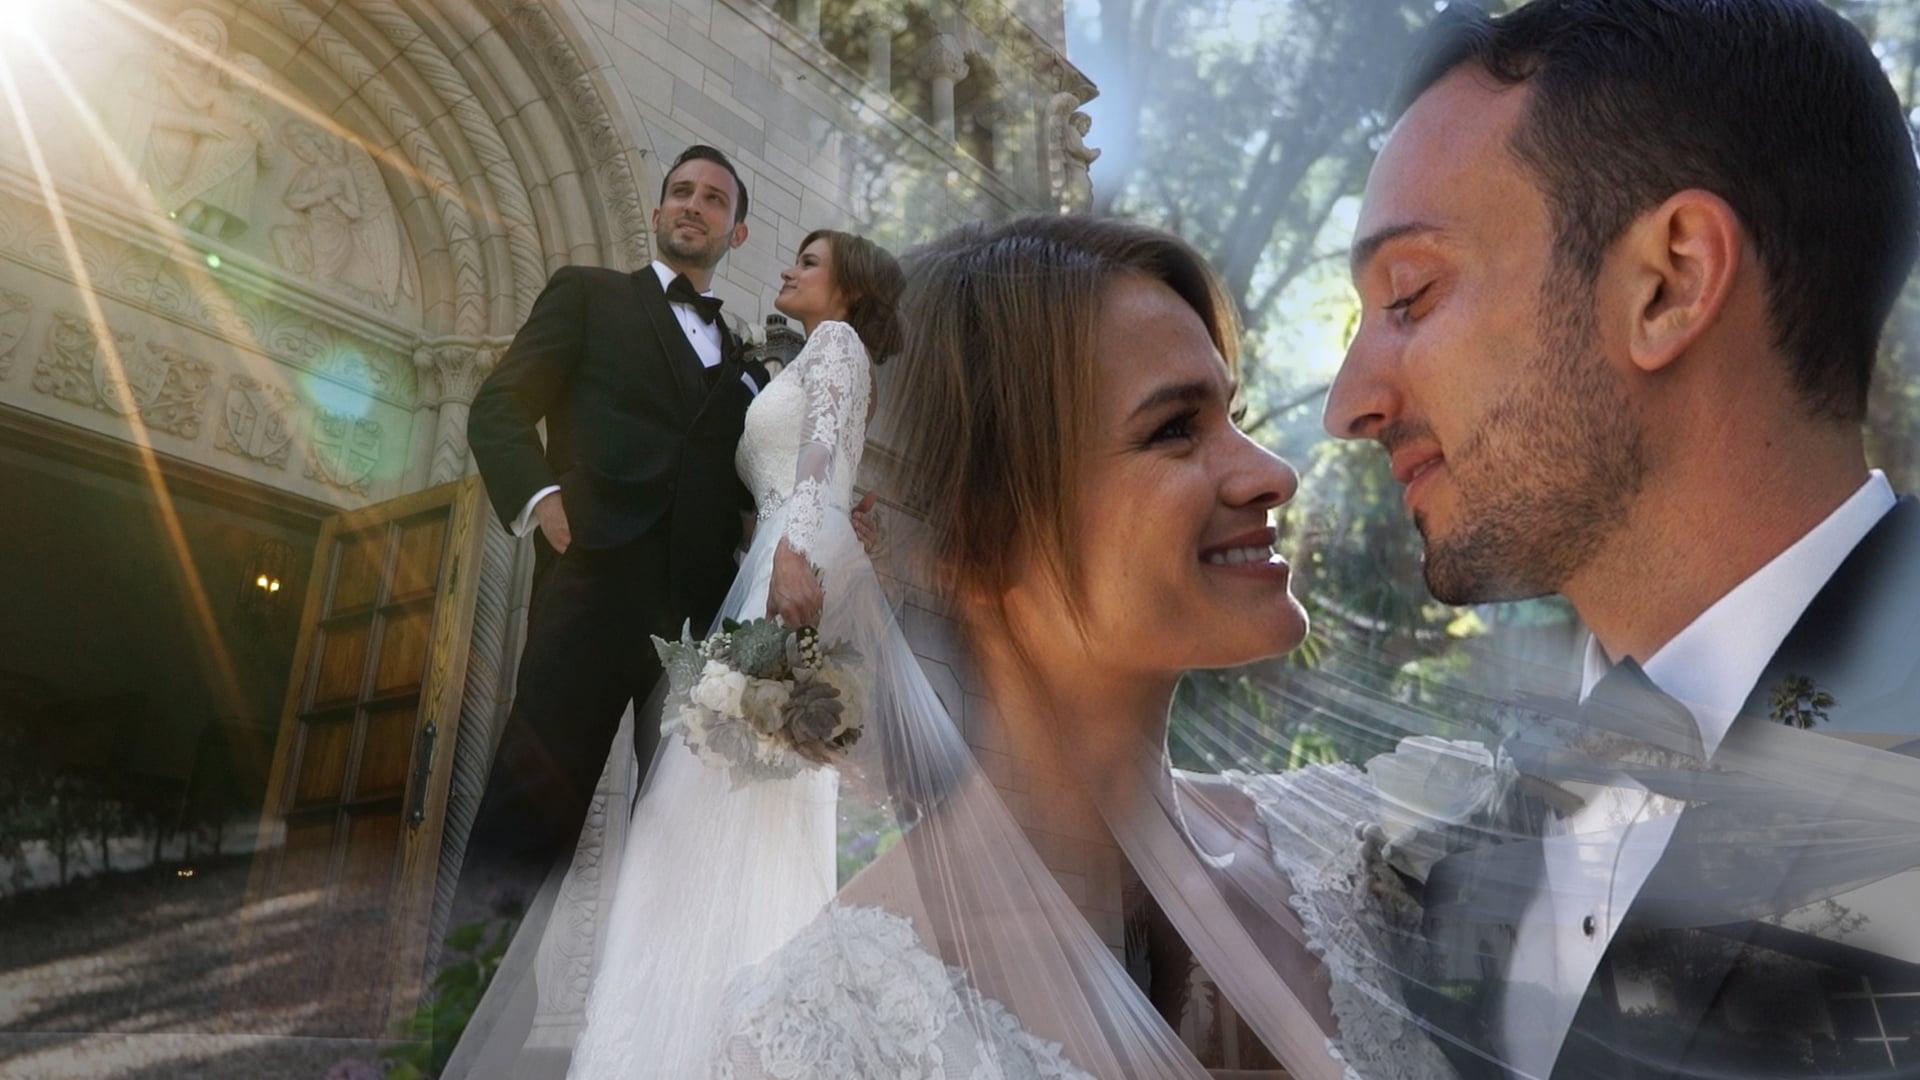 Stephanie and Gian Luca's Wedding Day